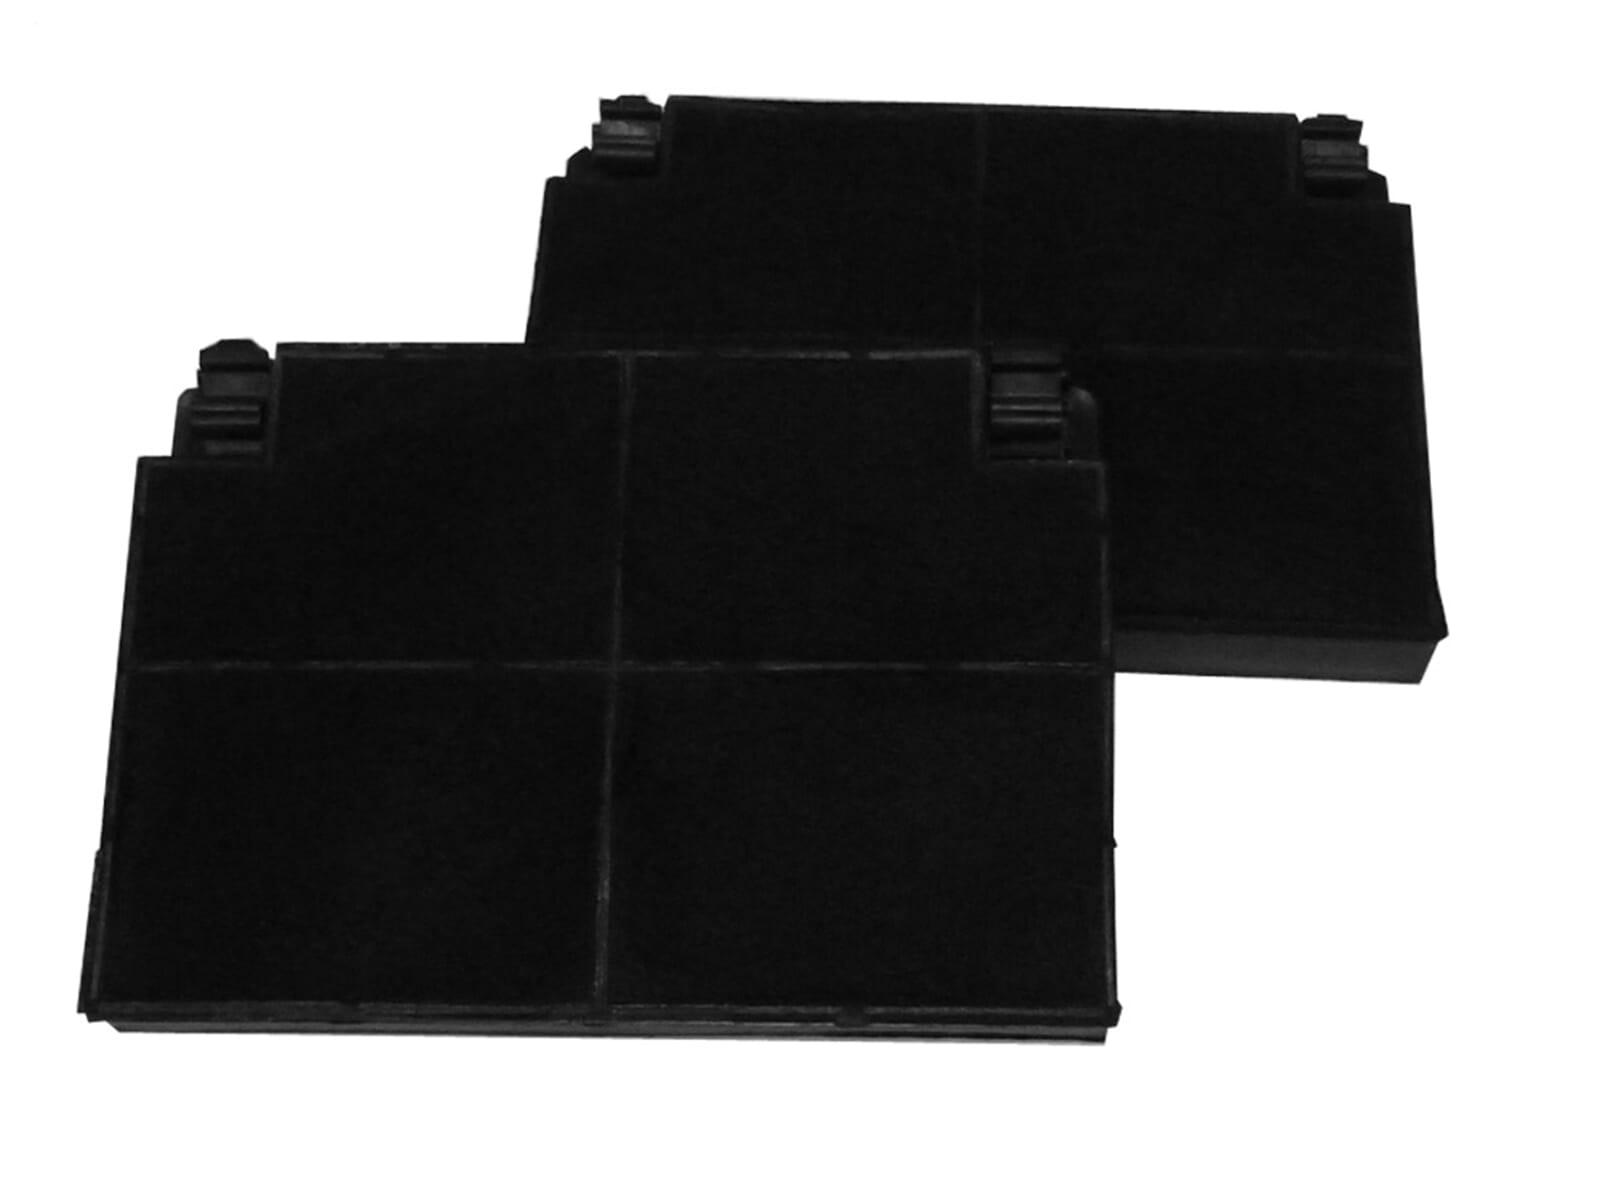 franke faber aktivkohlefilter umluftbetrieb zubeh r flexa vitro 60 ebay. Black Bedroom Furniture Sets. Home Design Ideas